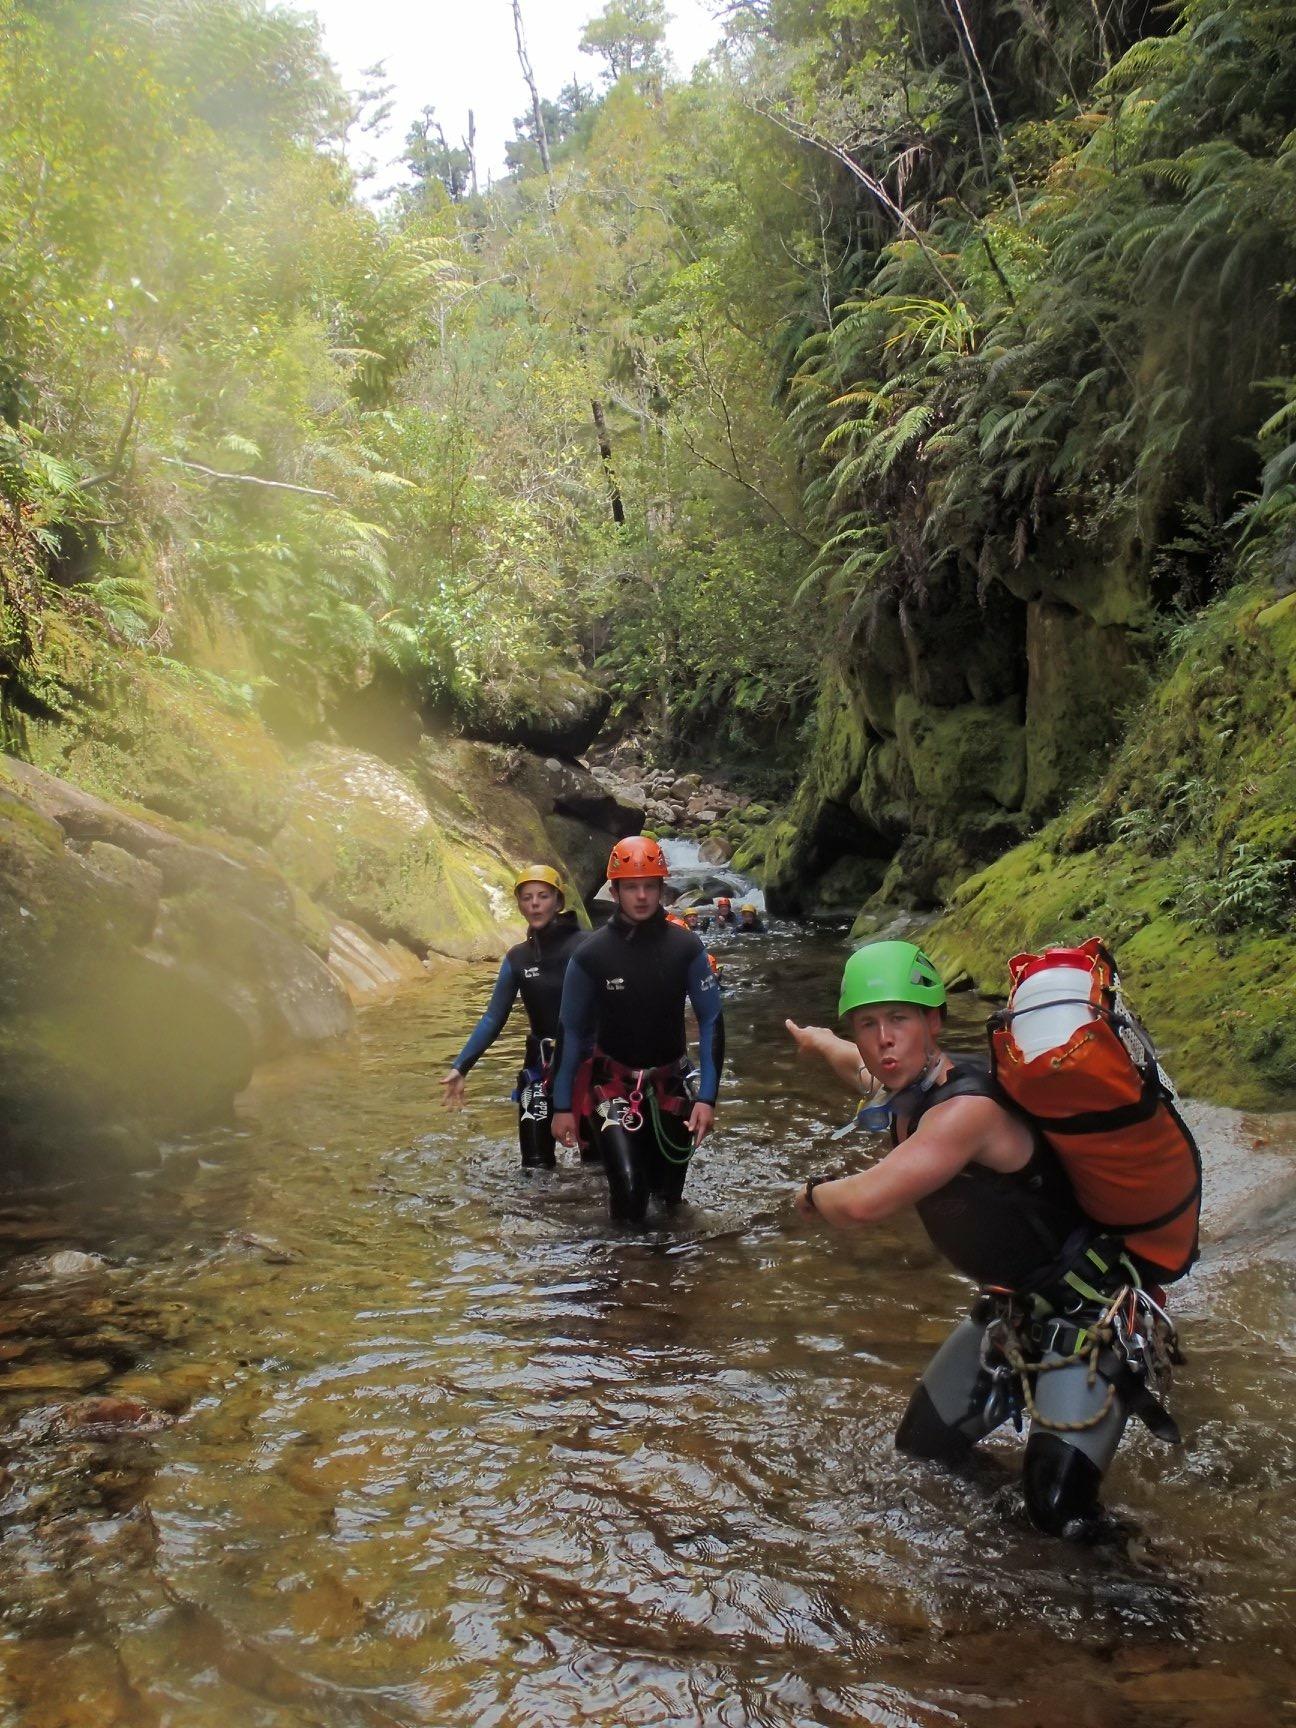 Fun times guiding in New Zealand.